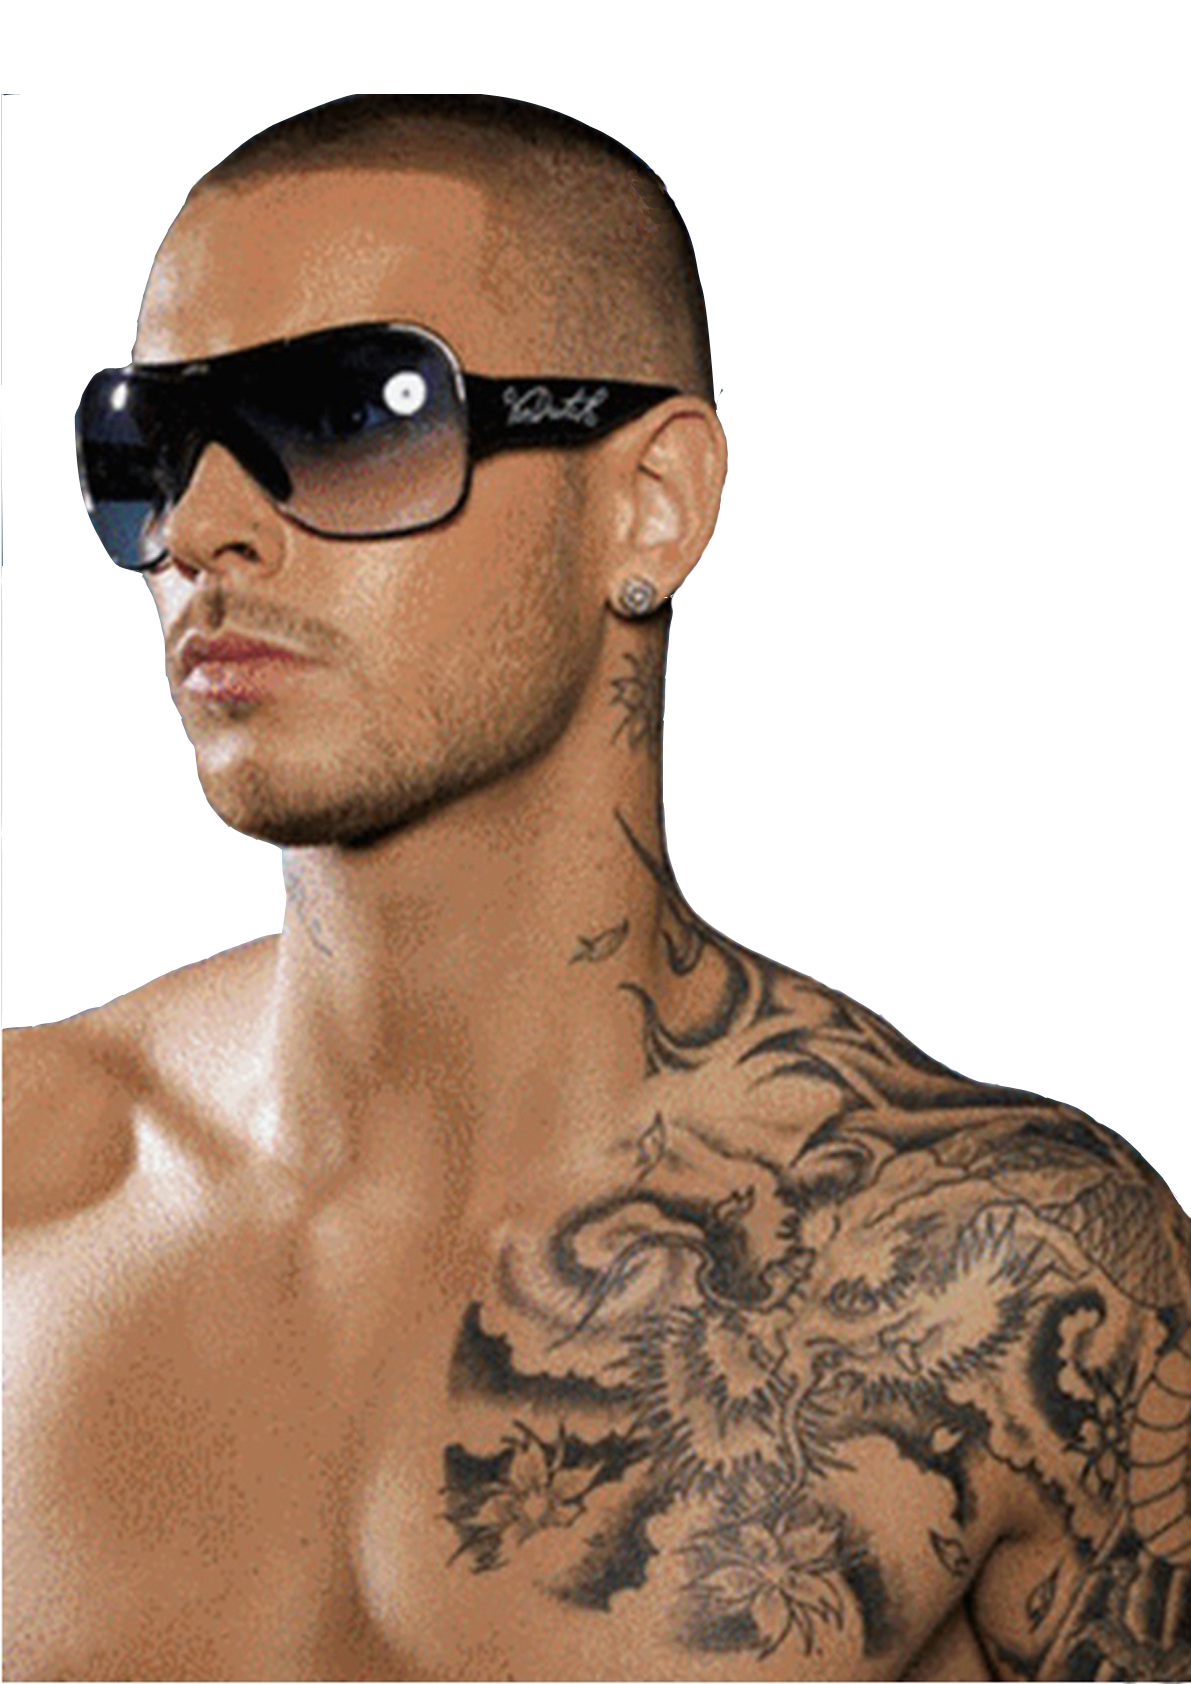 Idée tatouage homme torse